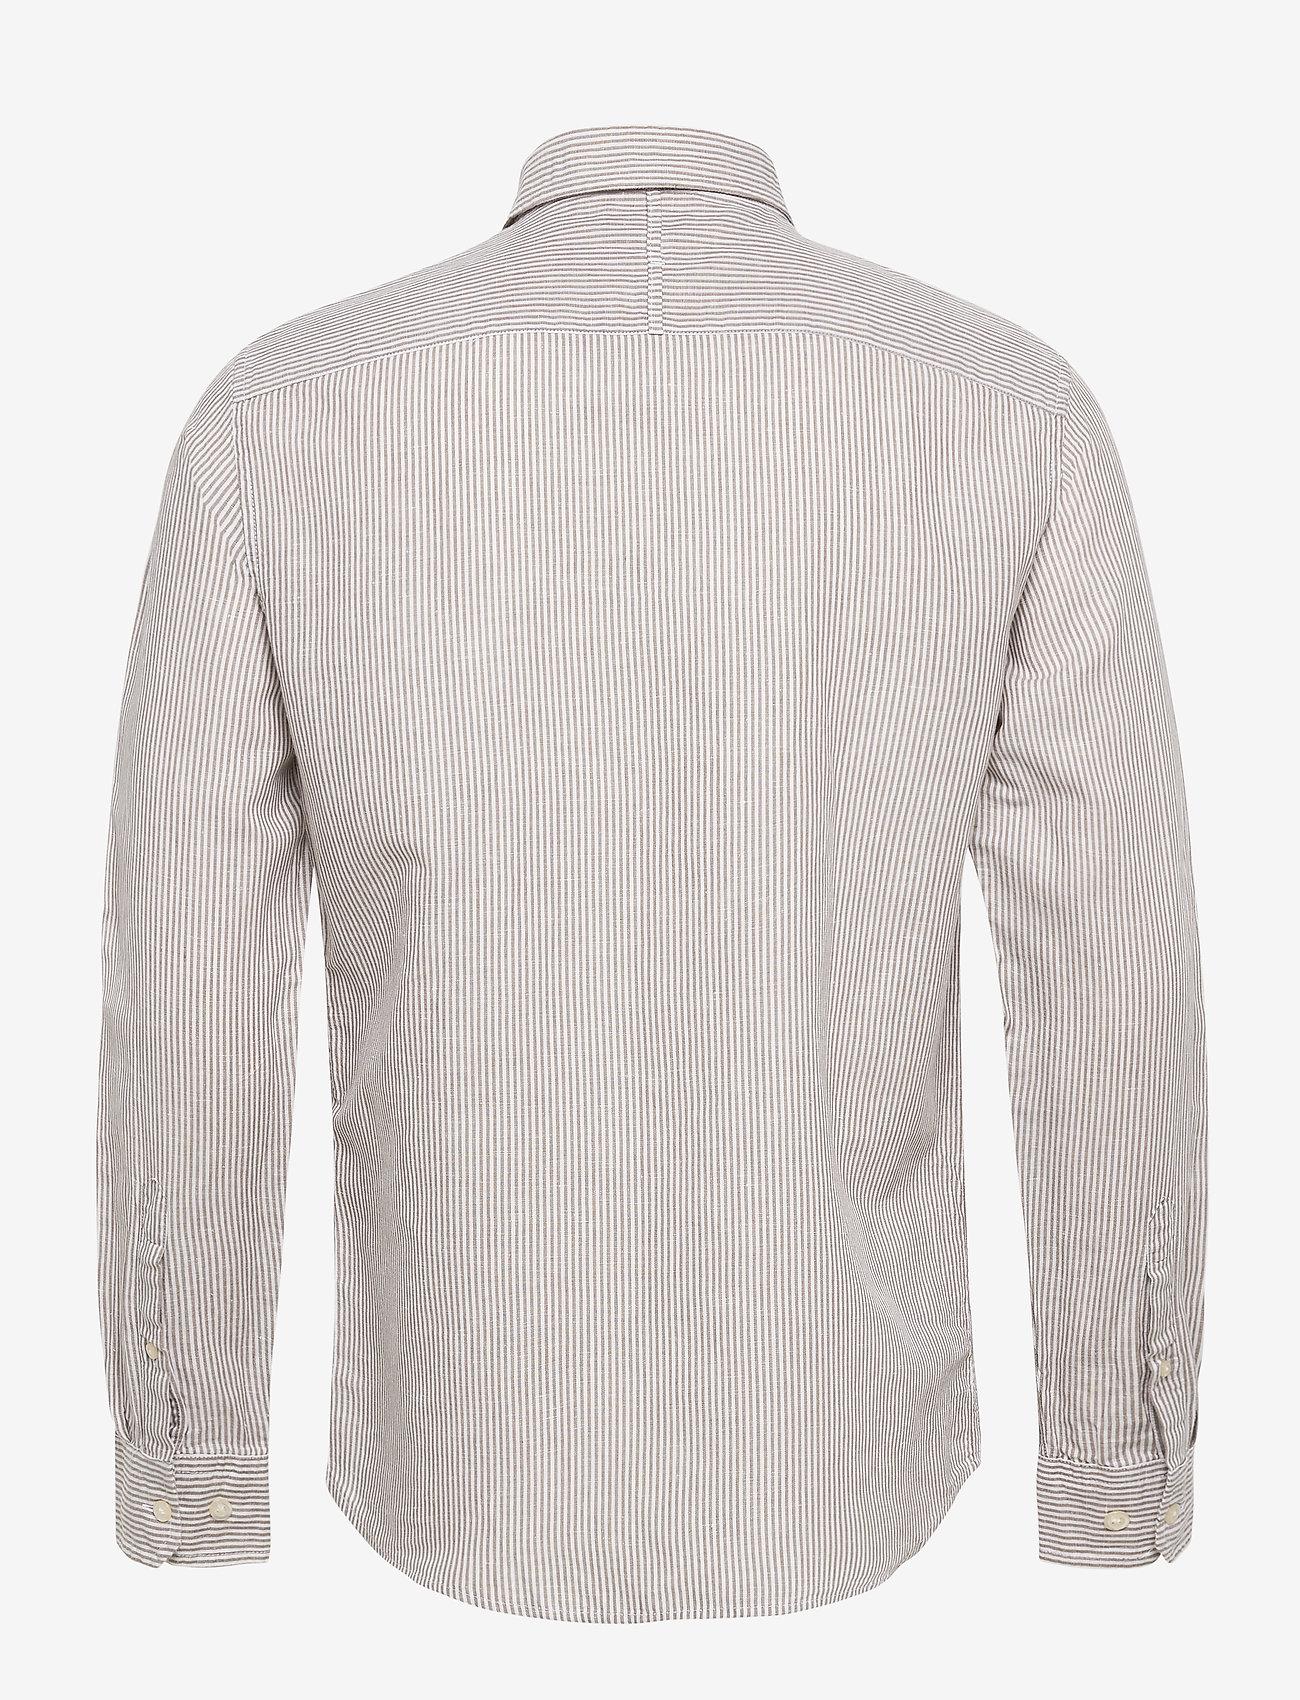 Banana Republic - Untucked Slim-Fit Linen-Cotton Shirt - casual shirts - brown mini stripe - 1